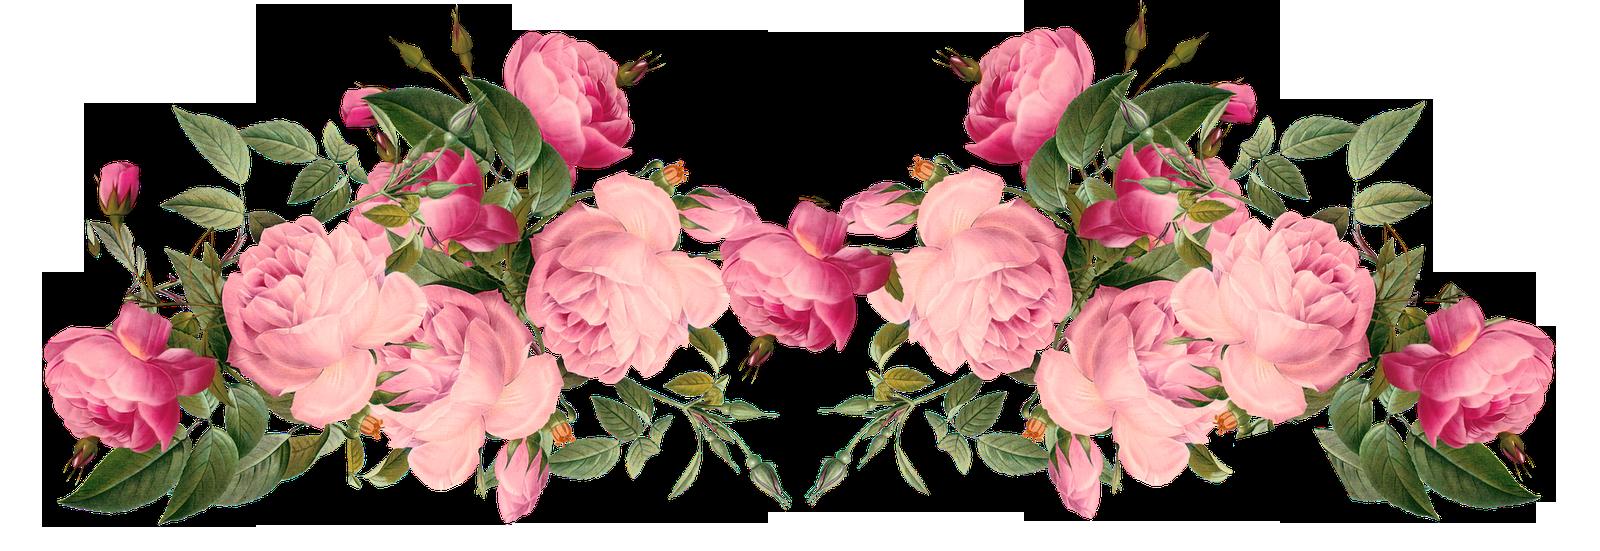 Pink Rose Borders | free pink roses border, vintage style - Flowers Borders  PNG - Rose Vine PNG HD